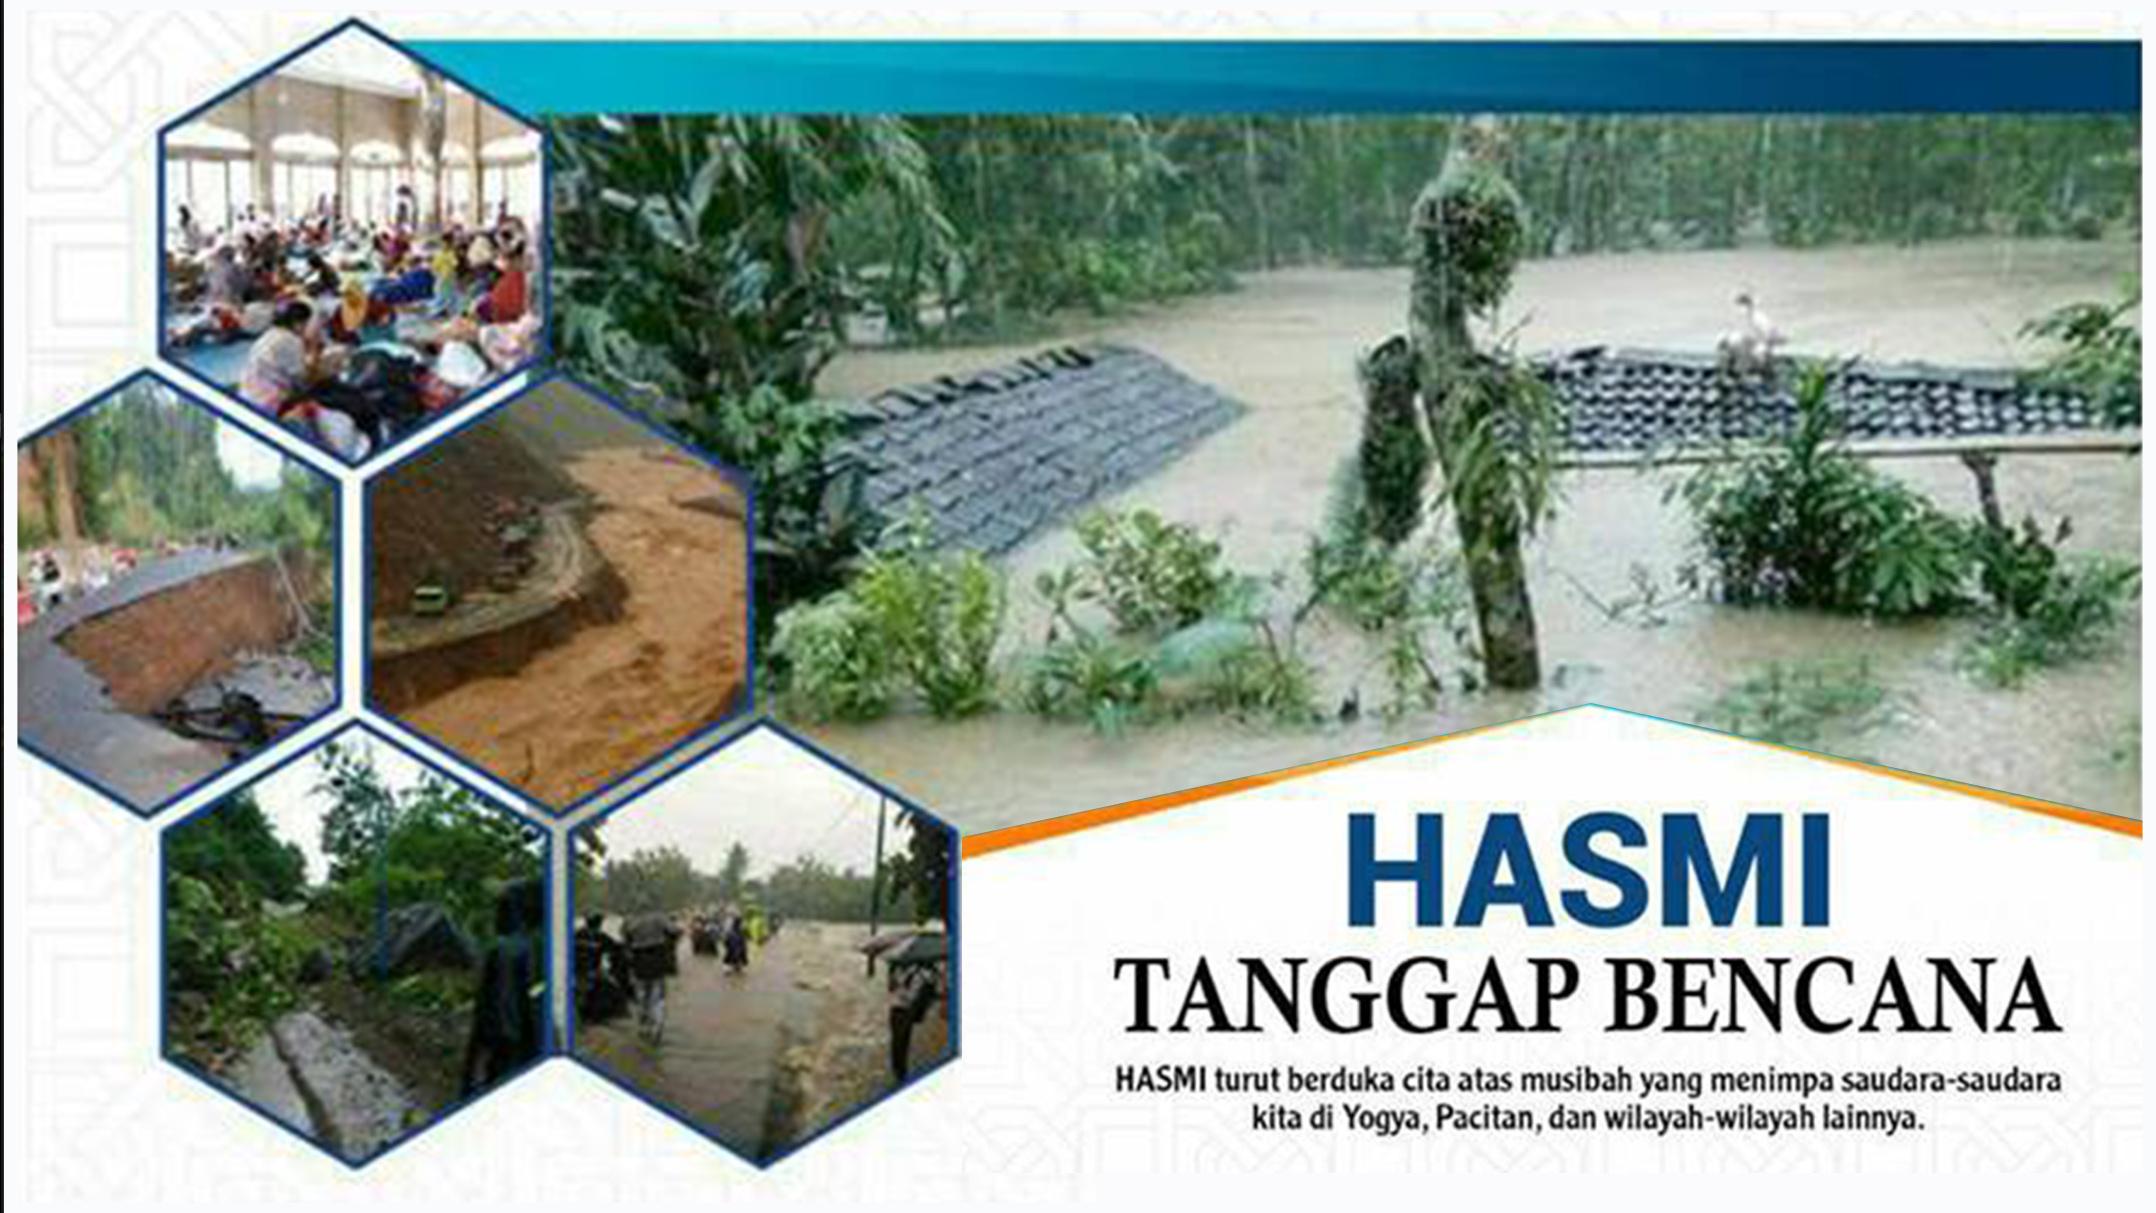 HASMI Tanggap Bencana – Yogyakarta, Pacitan Dan Sekitarnya